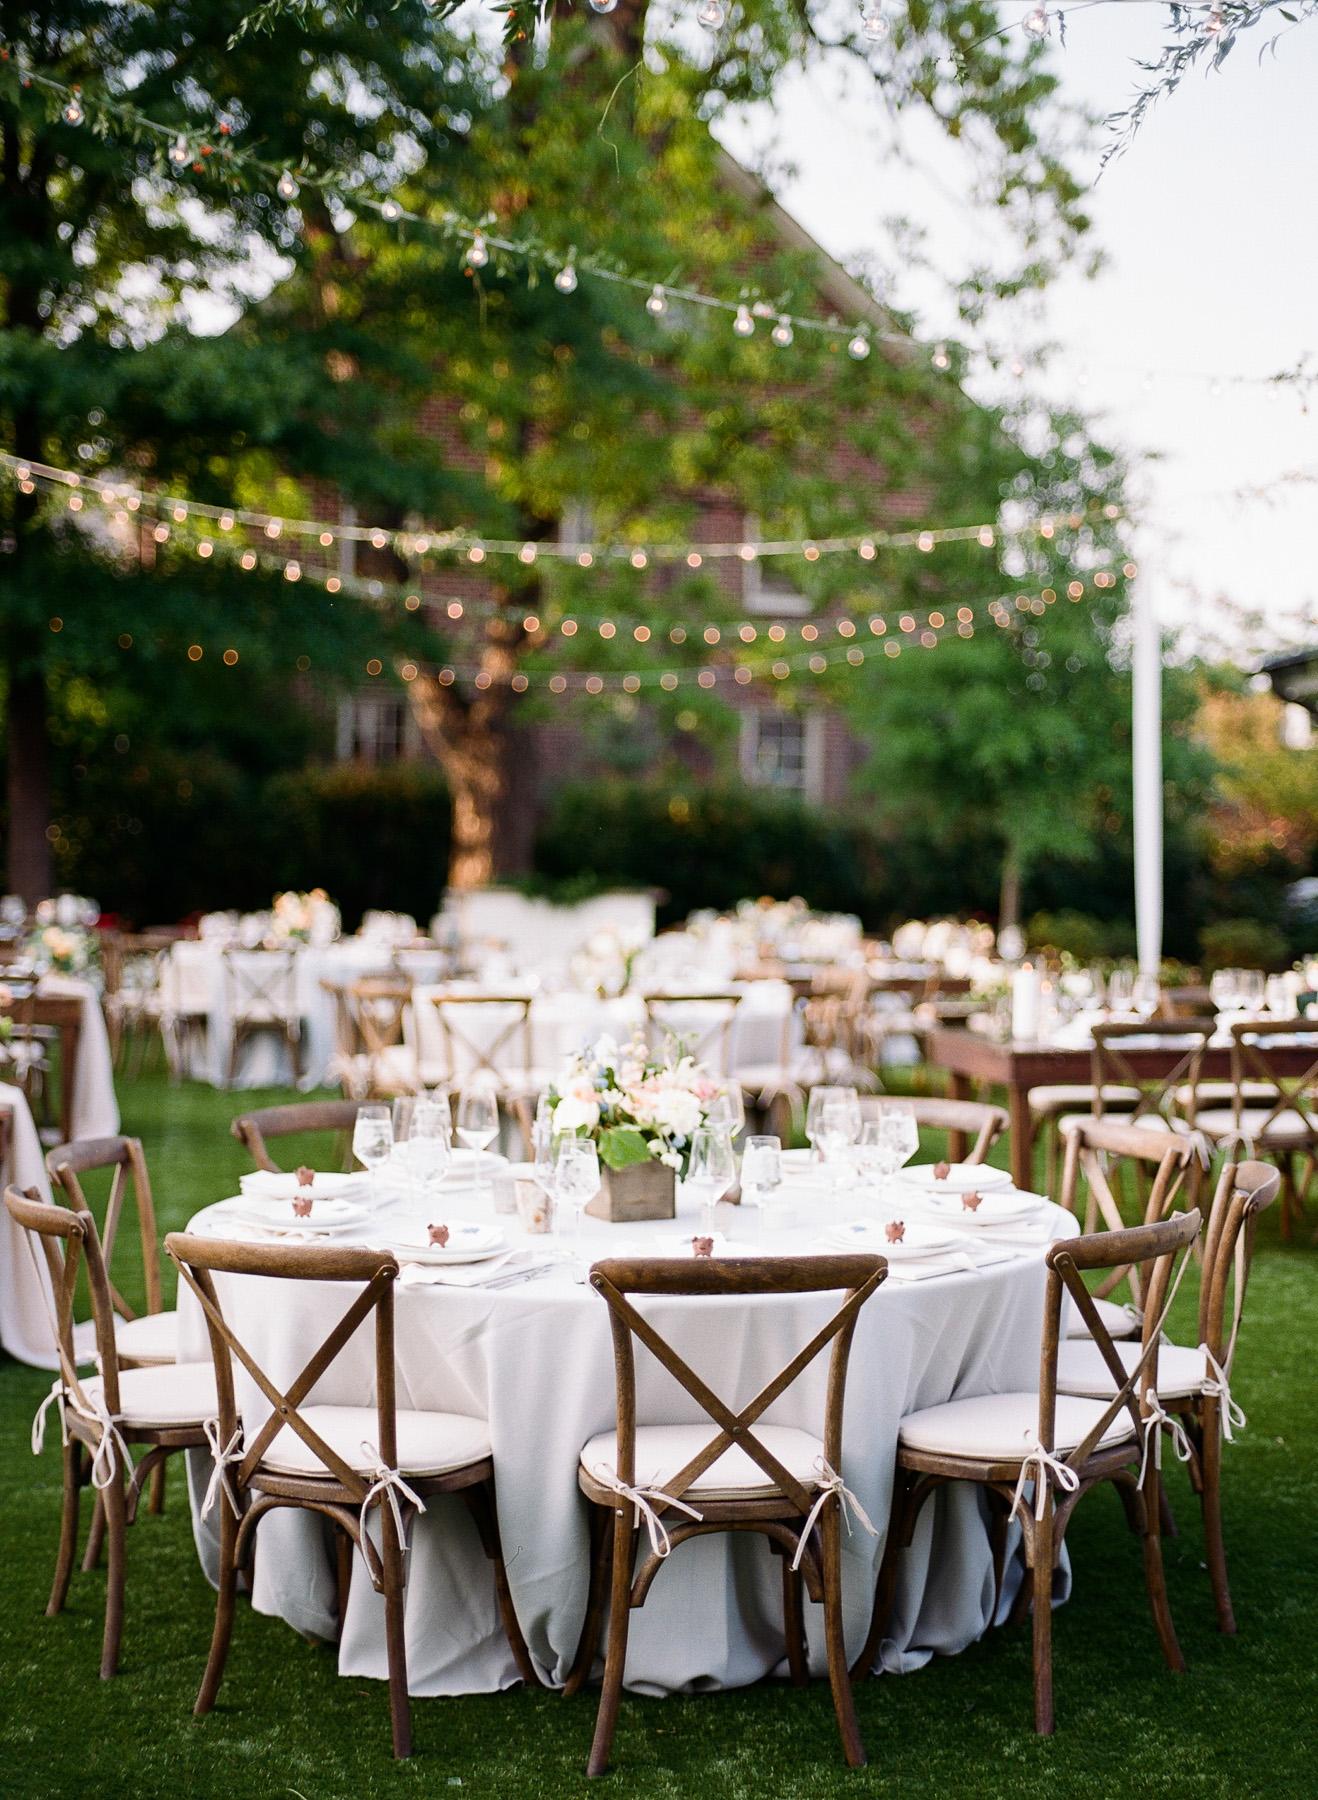 NC-wedding-photographer-best-21.jpg